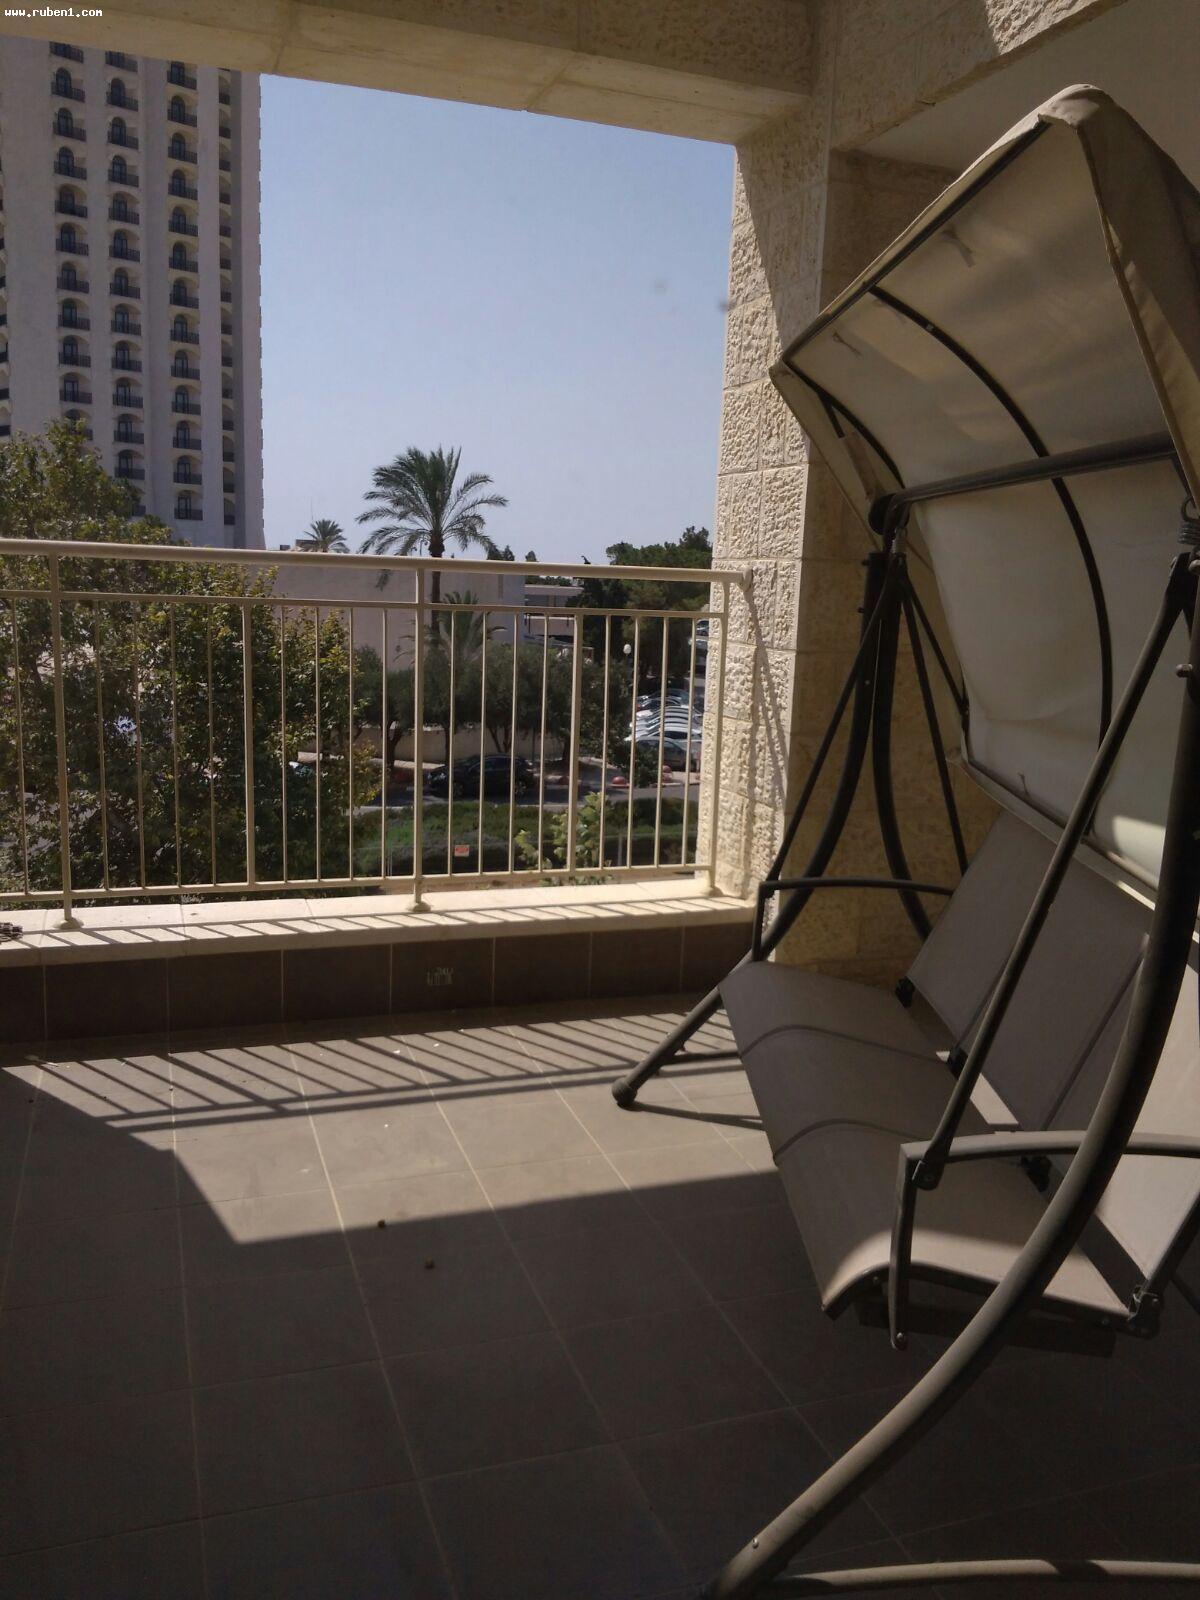 Real Estate Israel - Jerusalem Bayit Vagan משכנות האומה בבניין חדש, 3.5 חד', מרפסת גדולה,קומה 2,... Rubens Real Estate